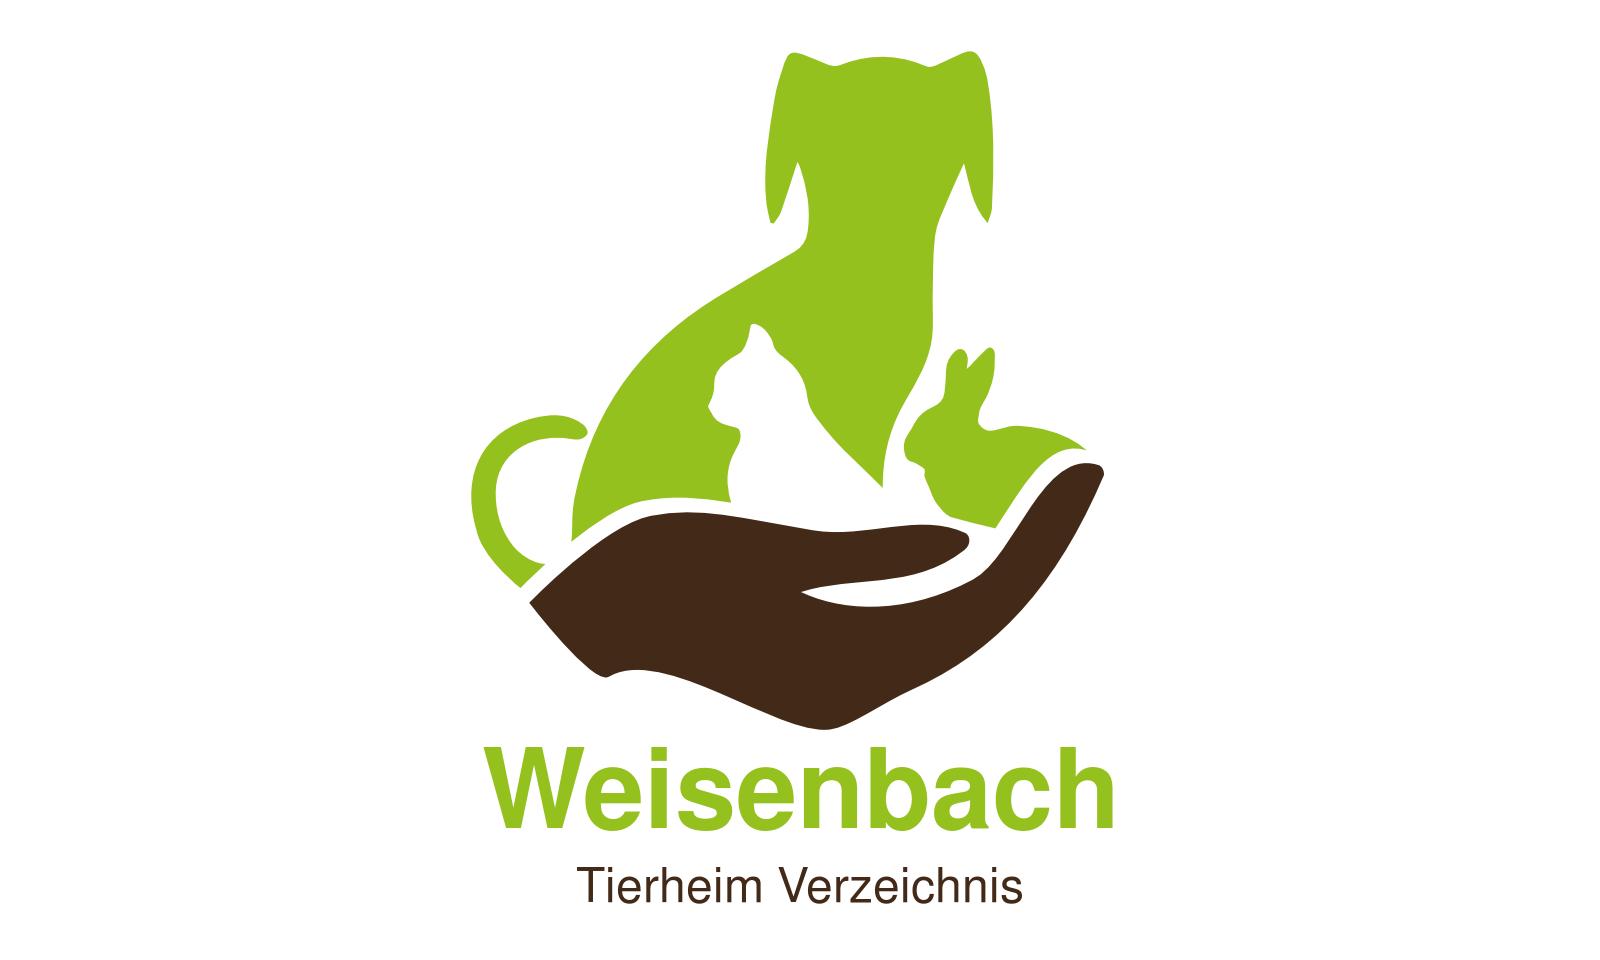 Tierheim Weisenbach